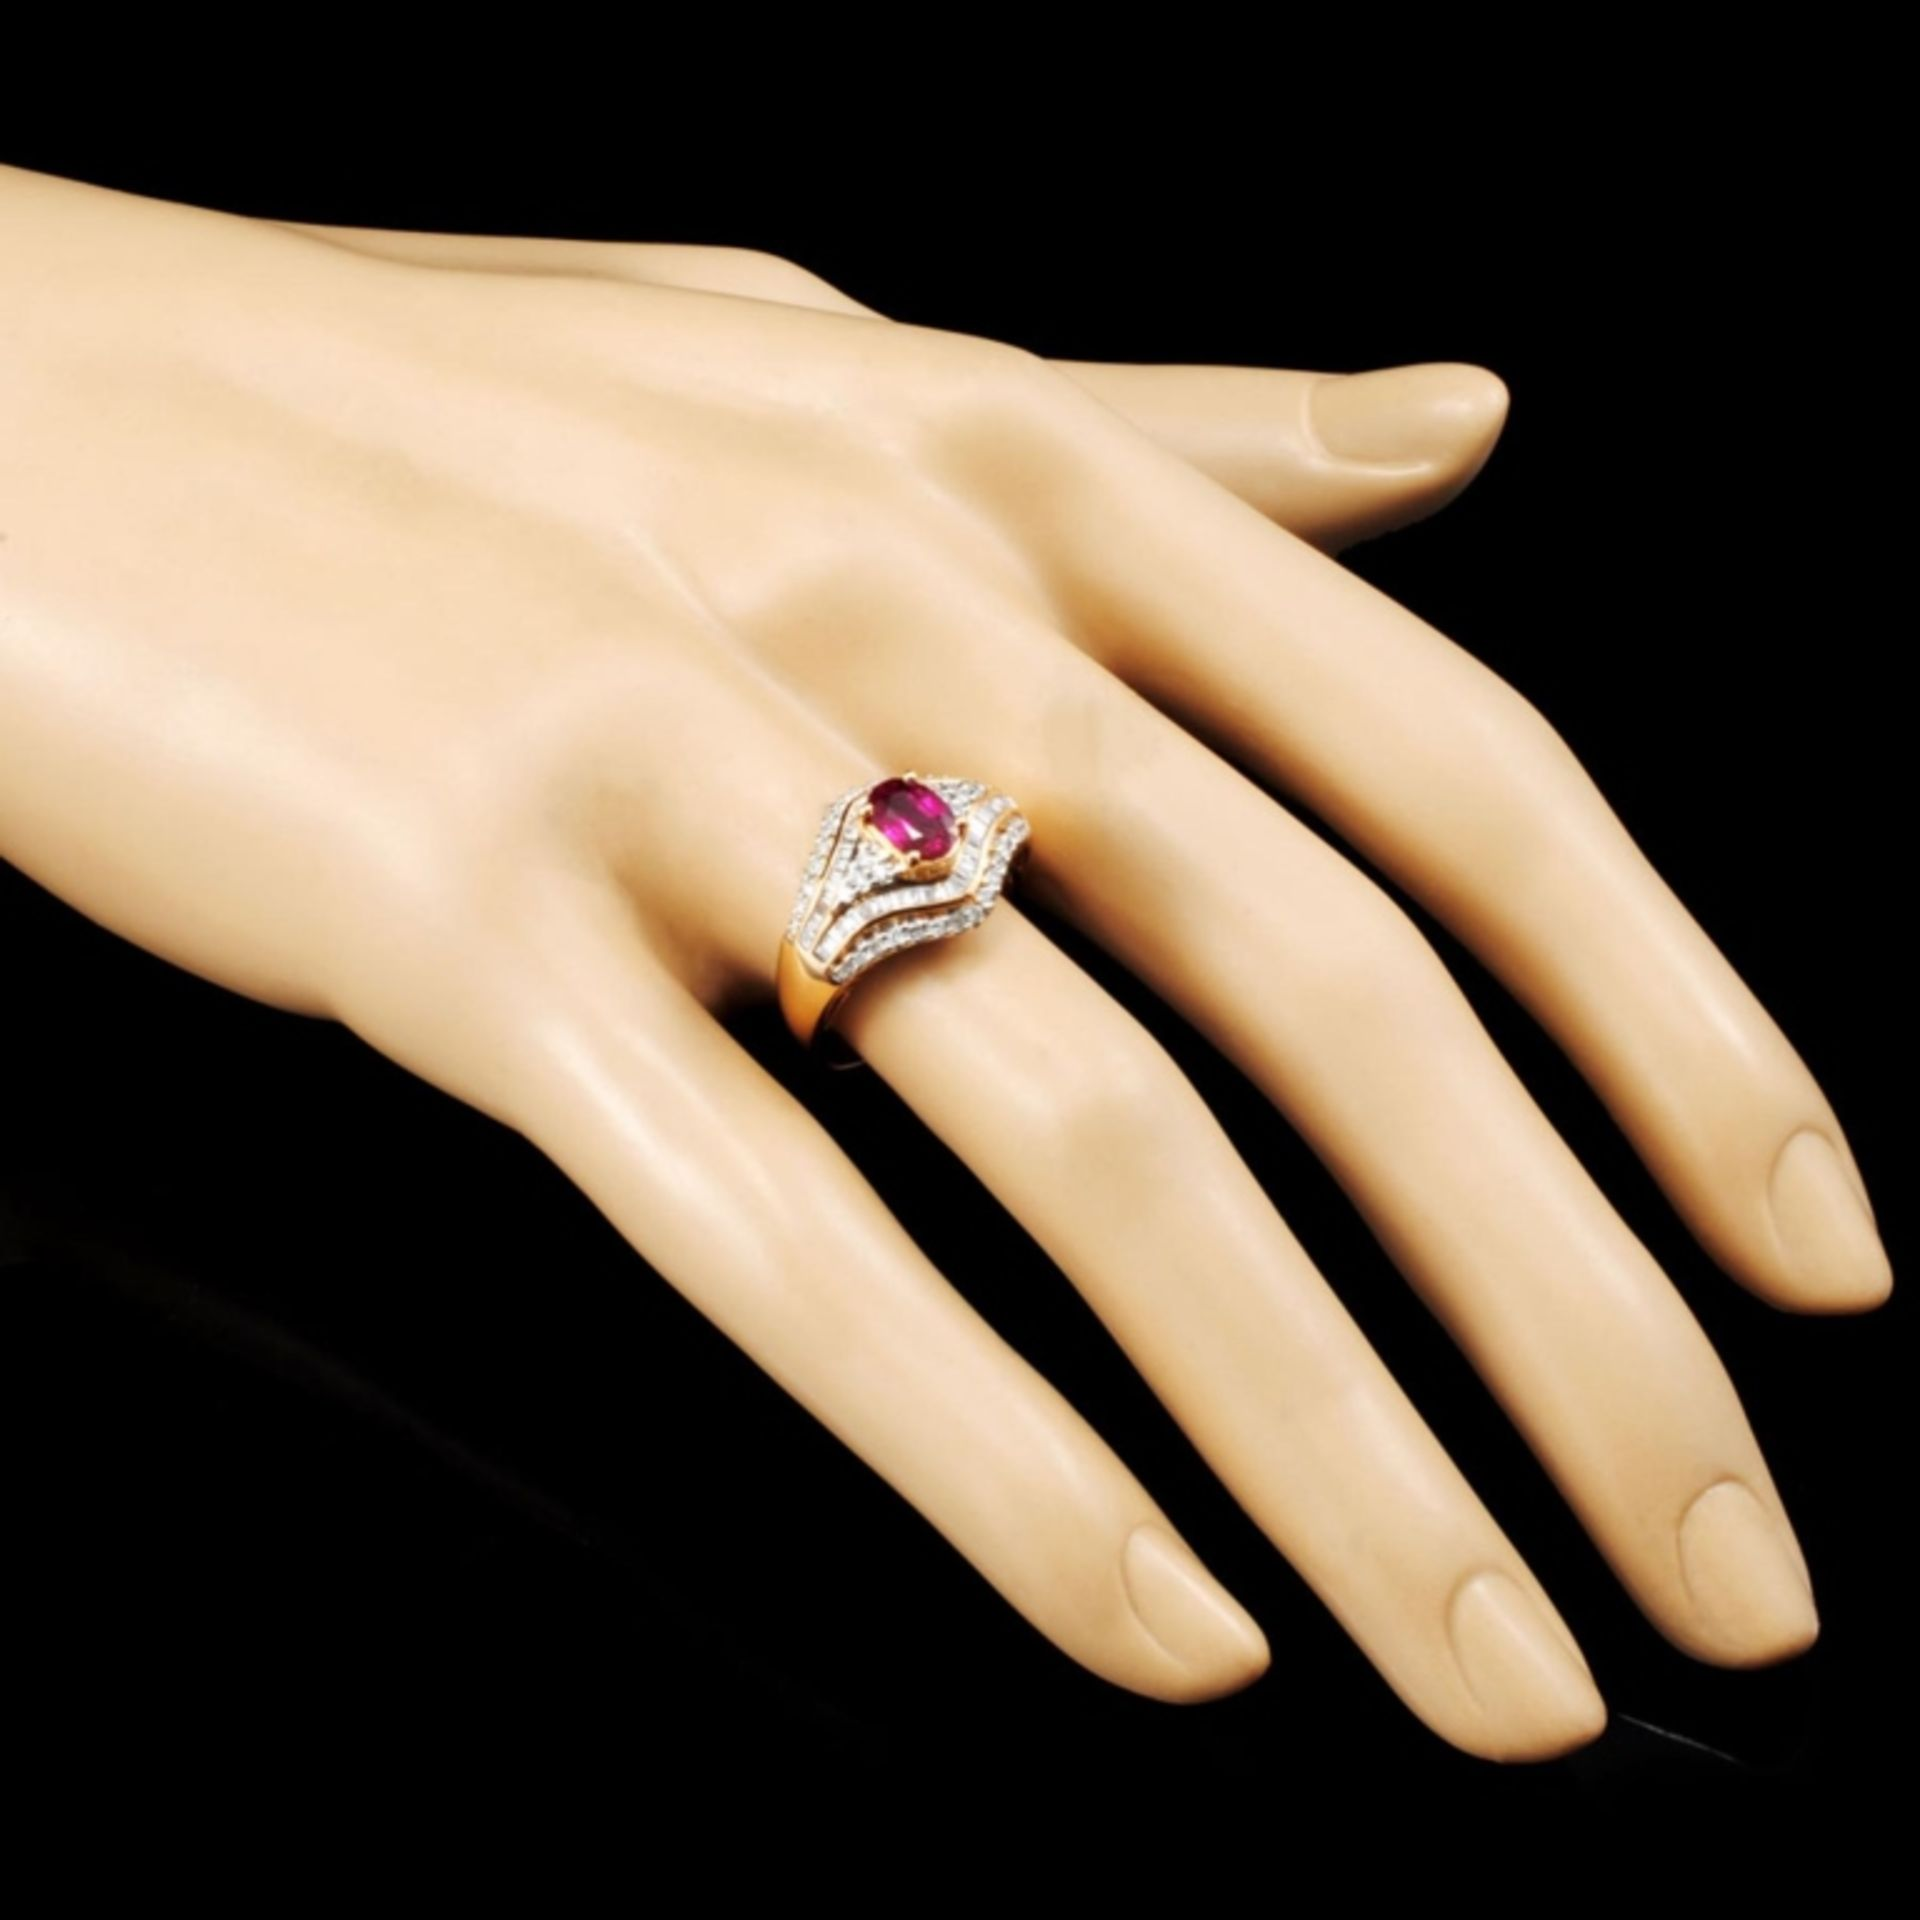 18K Gold 0.84ct Ruby & 0.60ctw Diamond Ring - Image 3 of 5